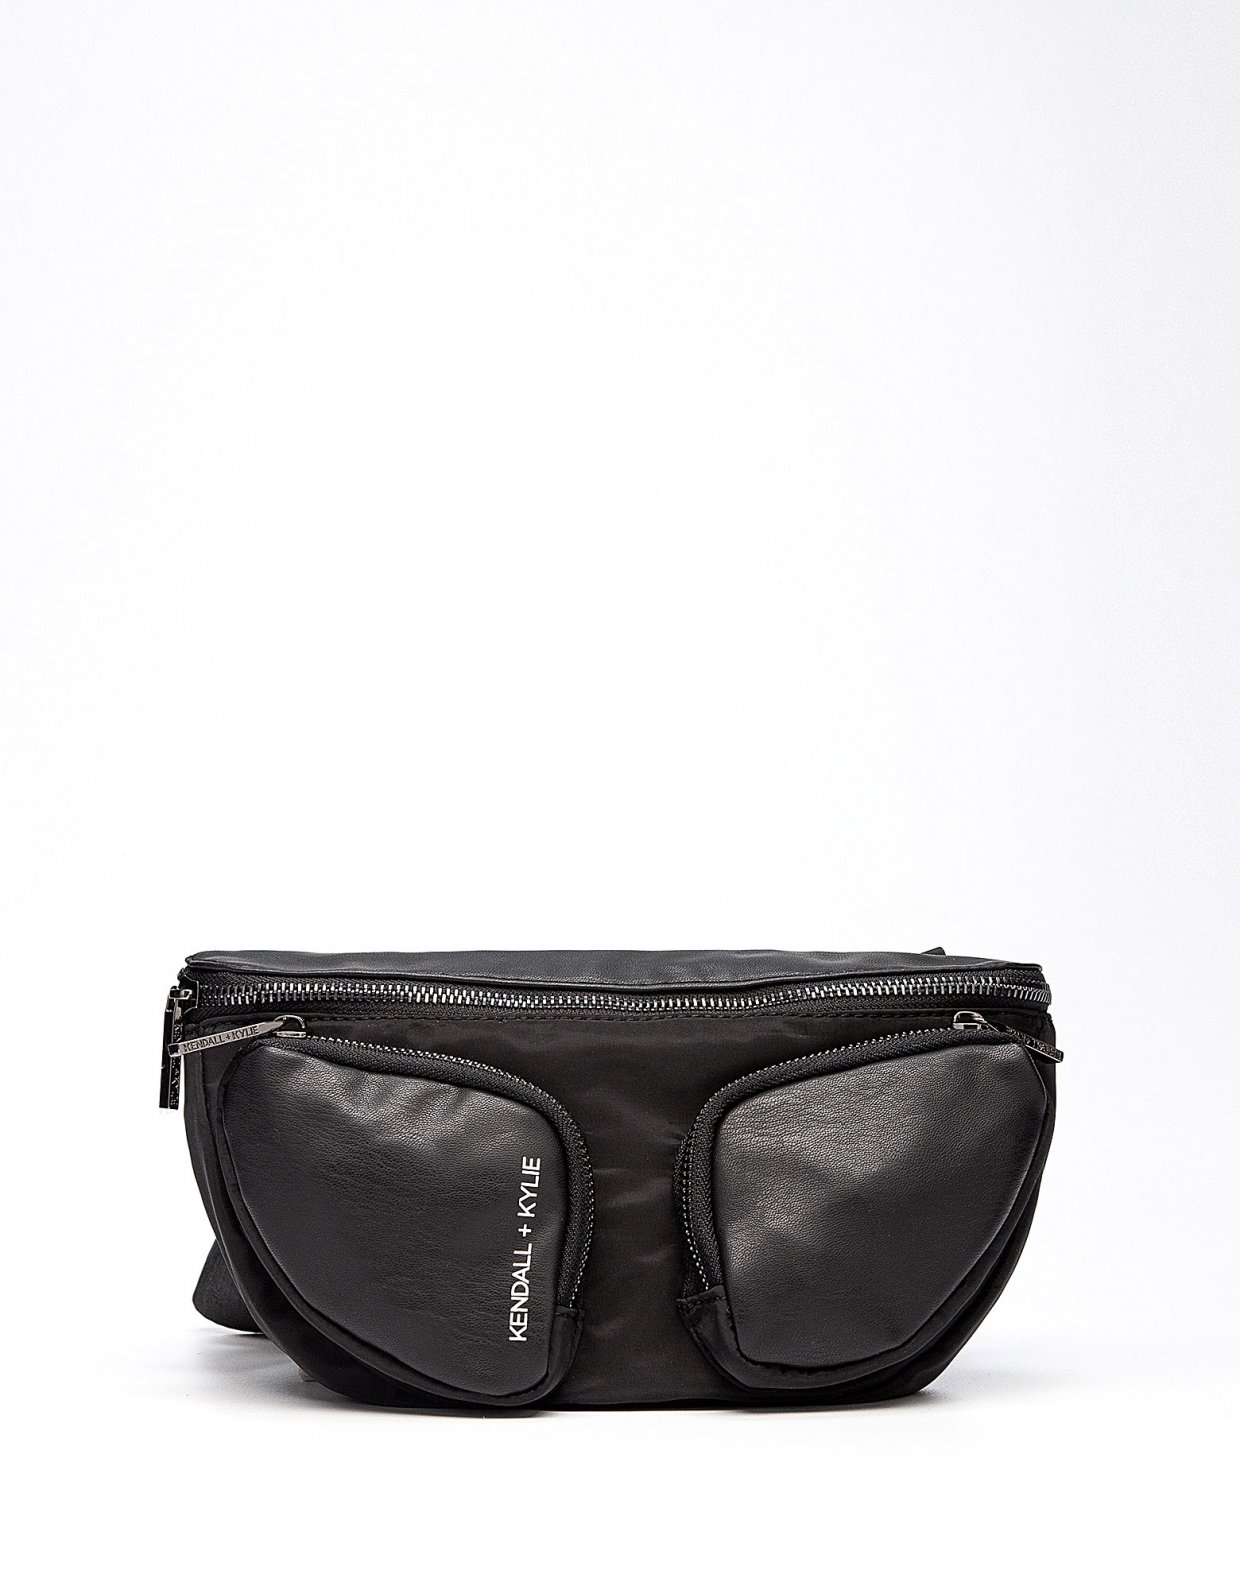 Kendall + Kylie Mia waist bag black